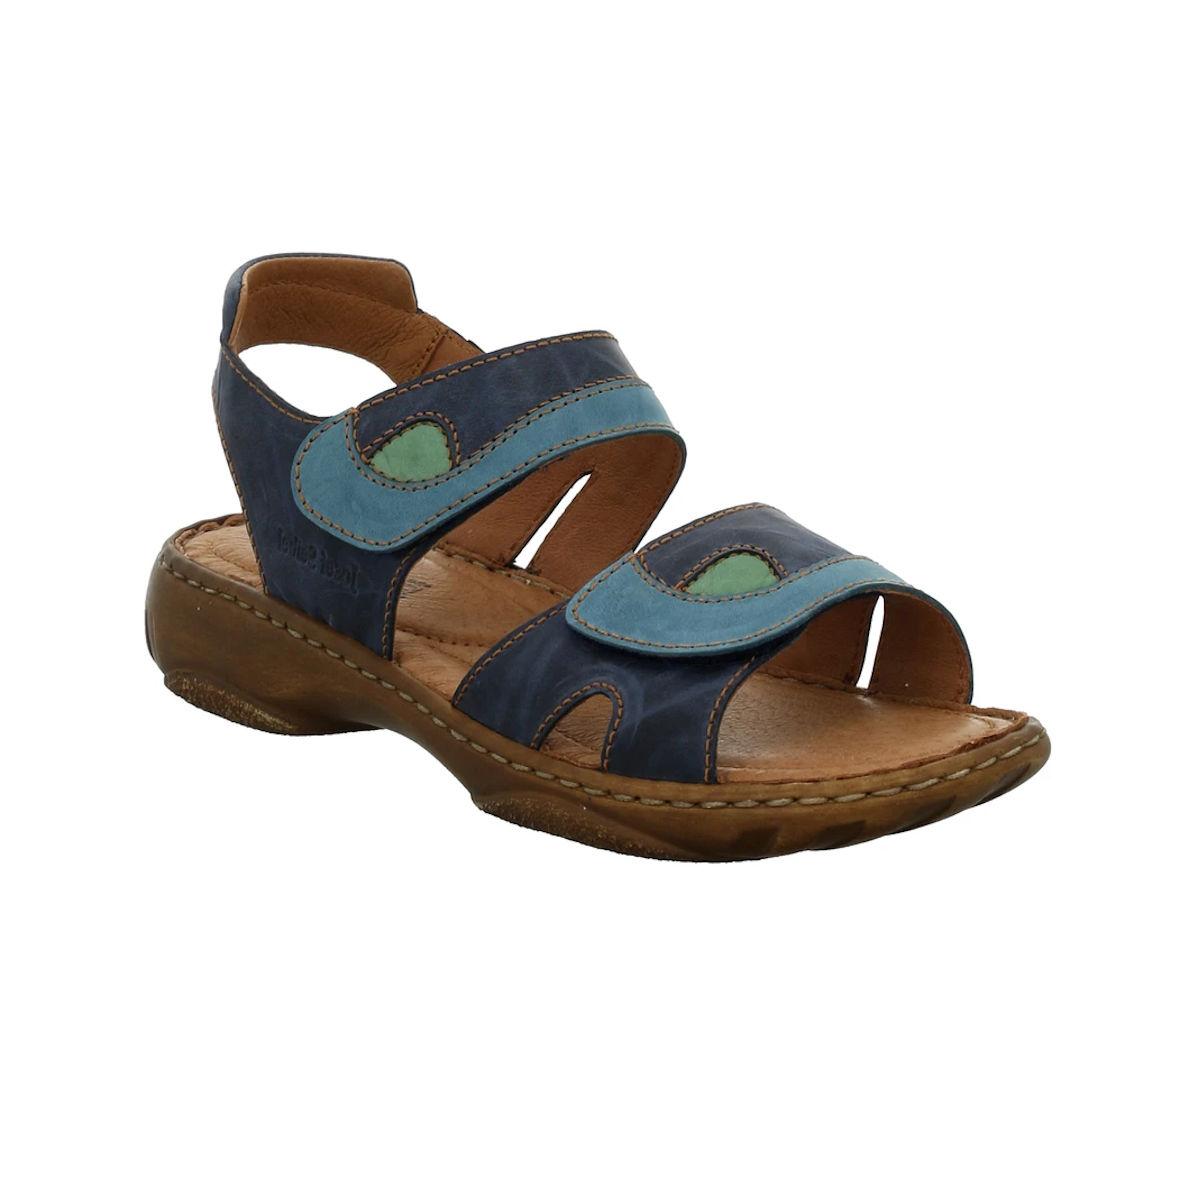 Josef Seibel Debra Blue Combi Sandal for wome